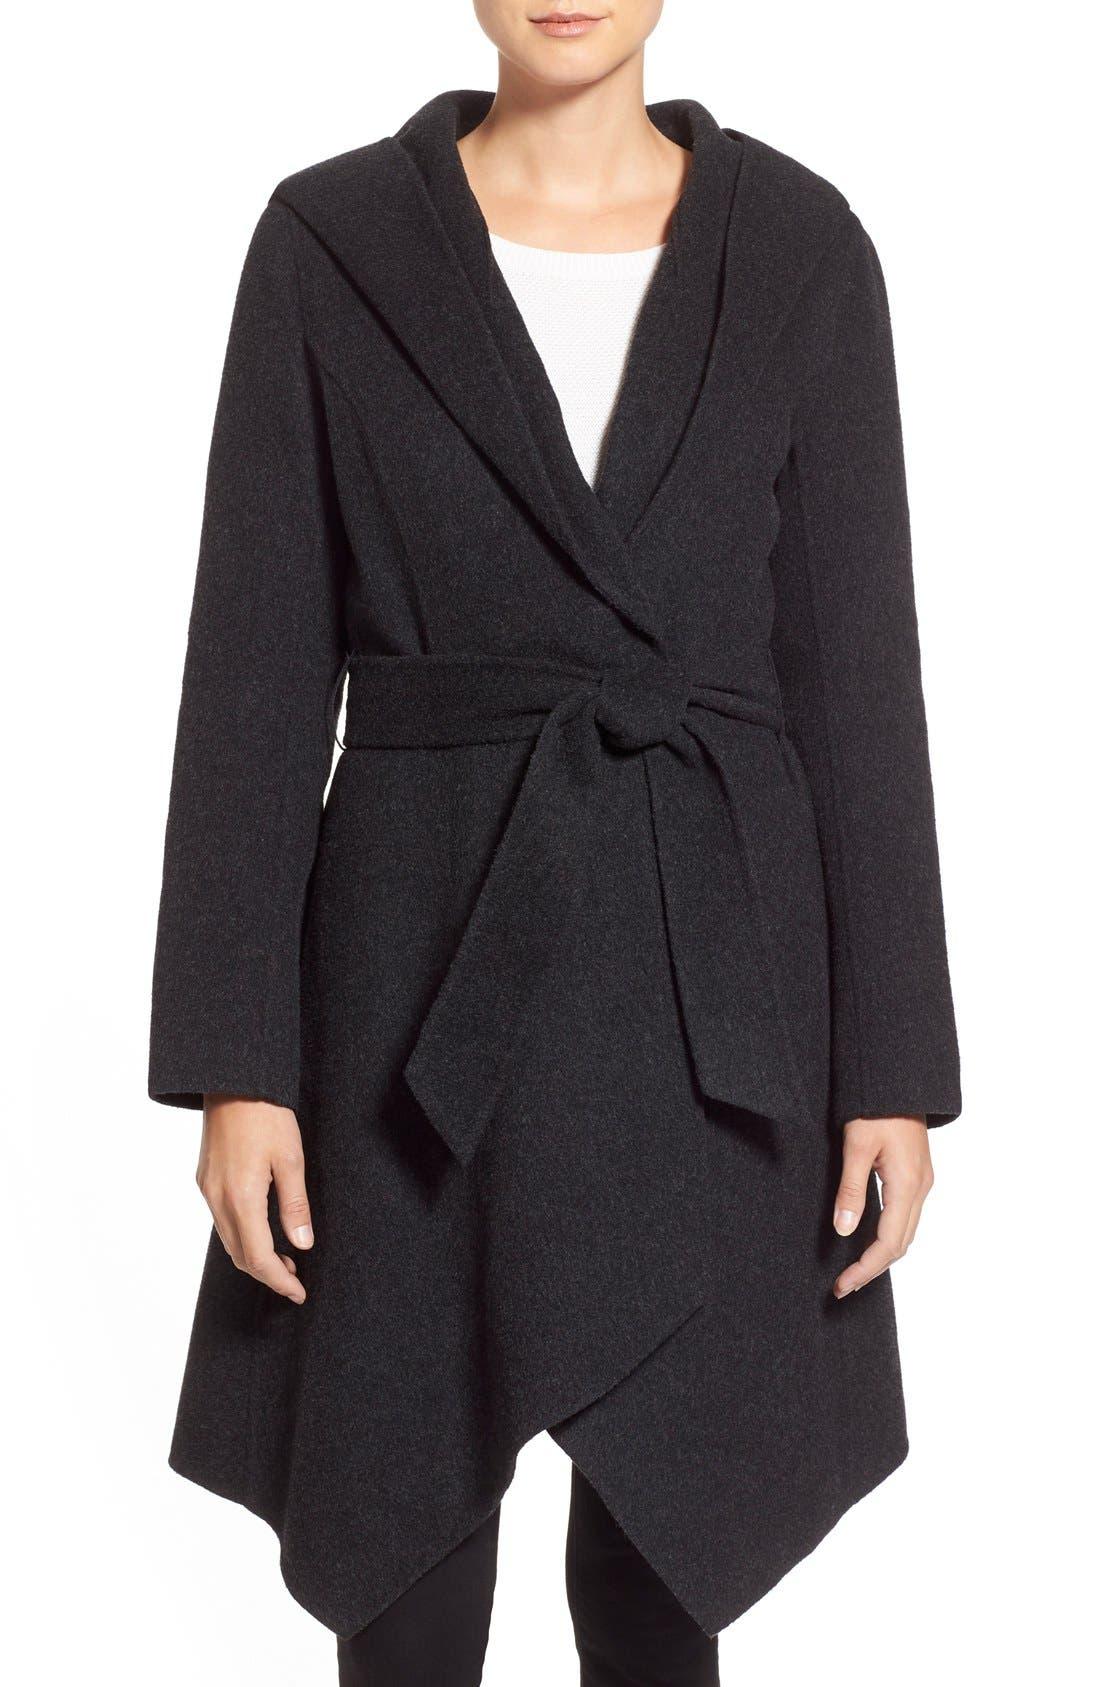 Alternate Image 1 Selected - ZAC Zac Posen 'Sophia' Belted Wool Blend Hooded Asymmetrical Coat